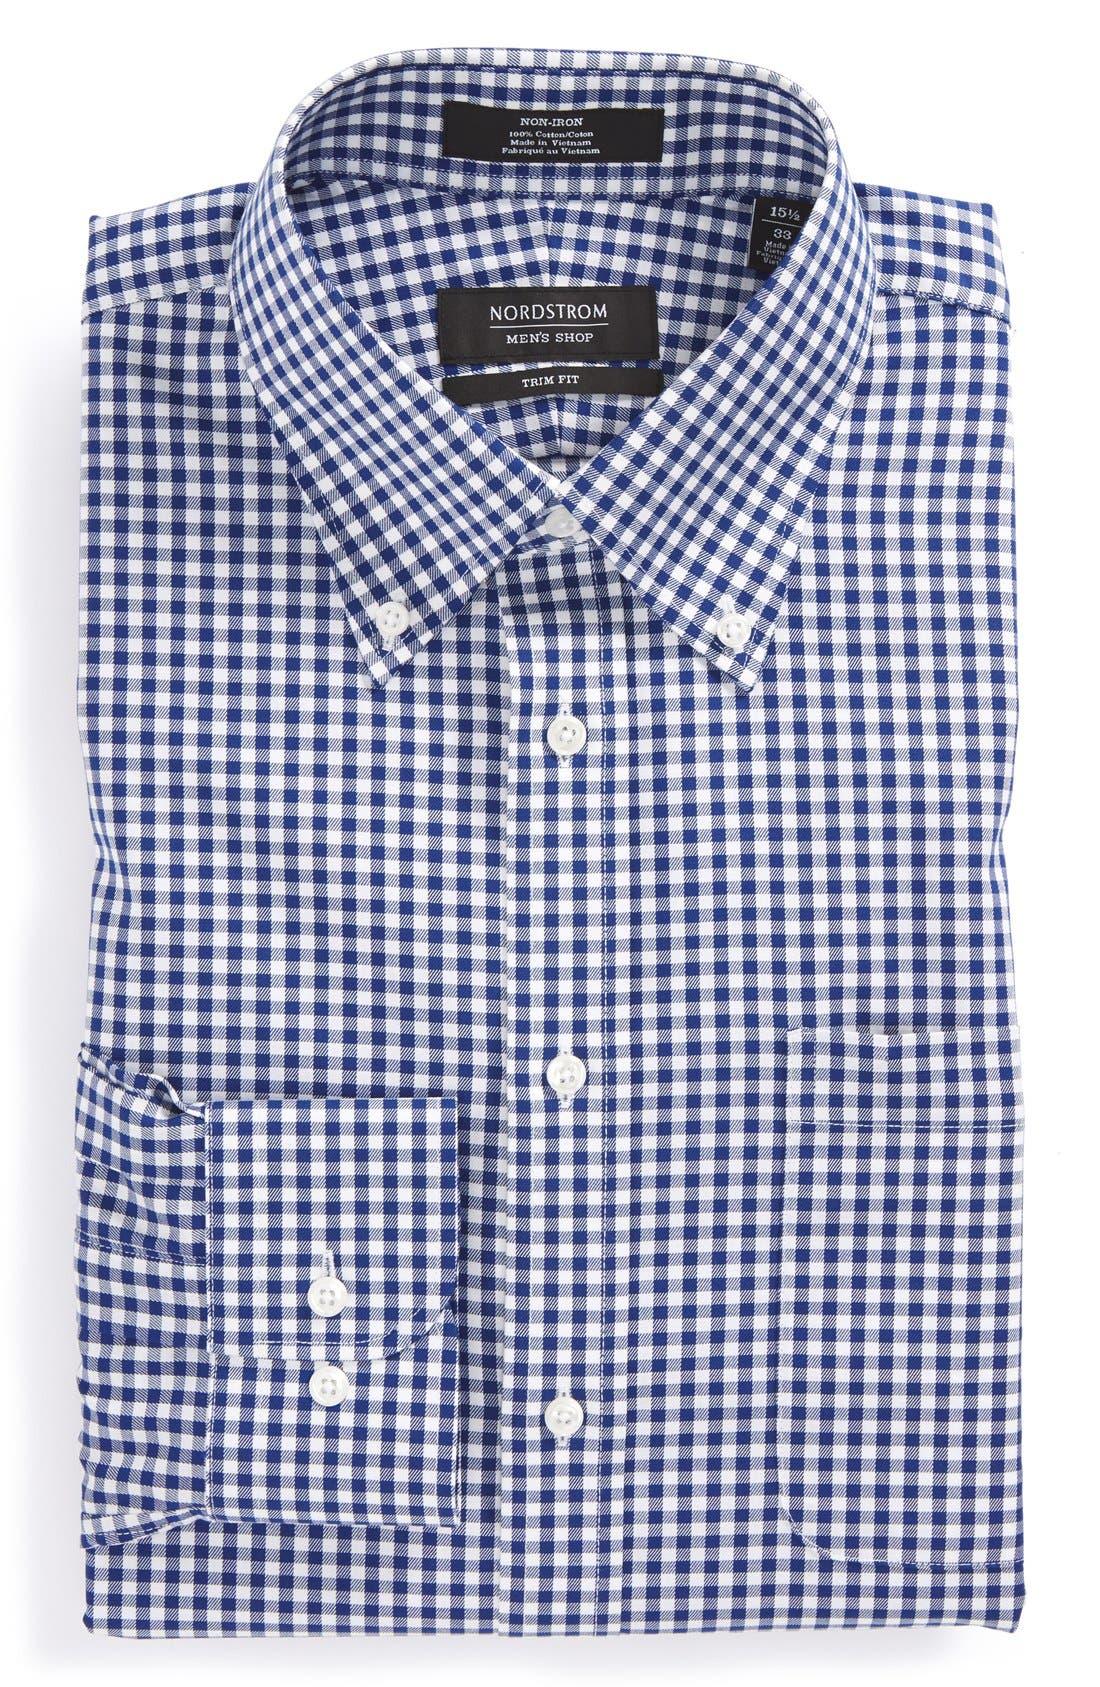 NORDSTROM MENS SHOP Trim Fit Non-Iron Gingham Dress Shirt